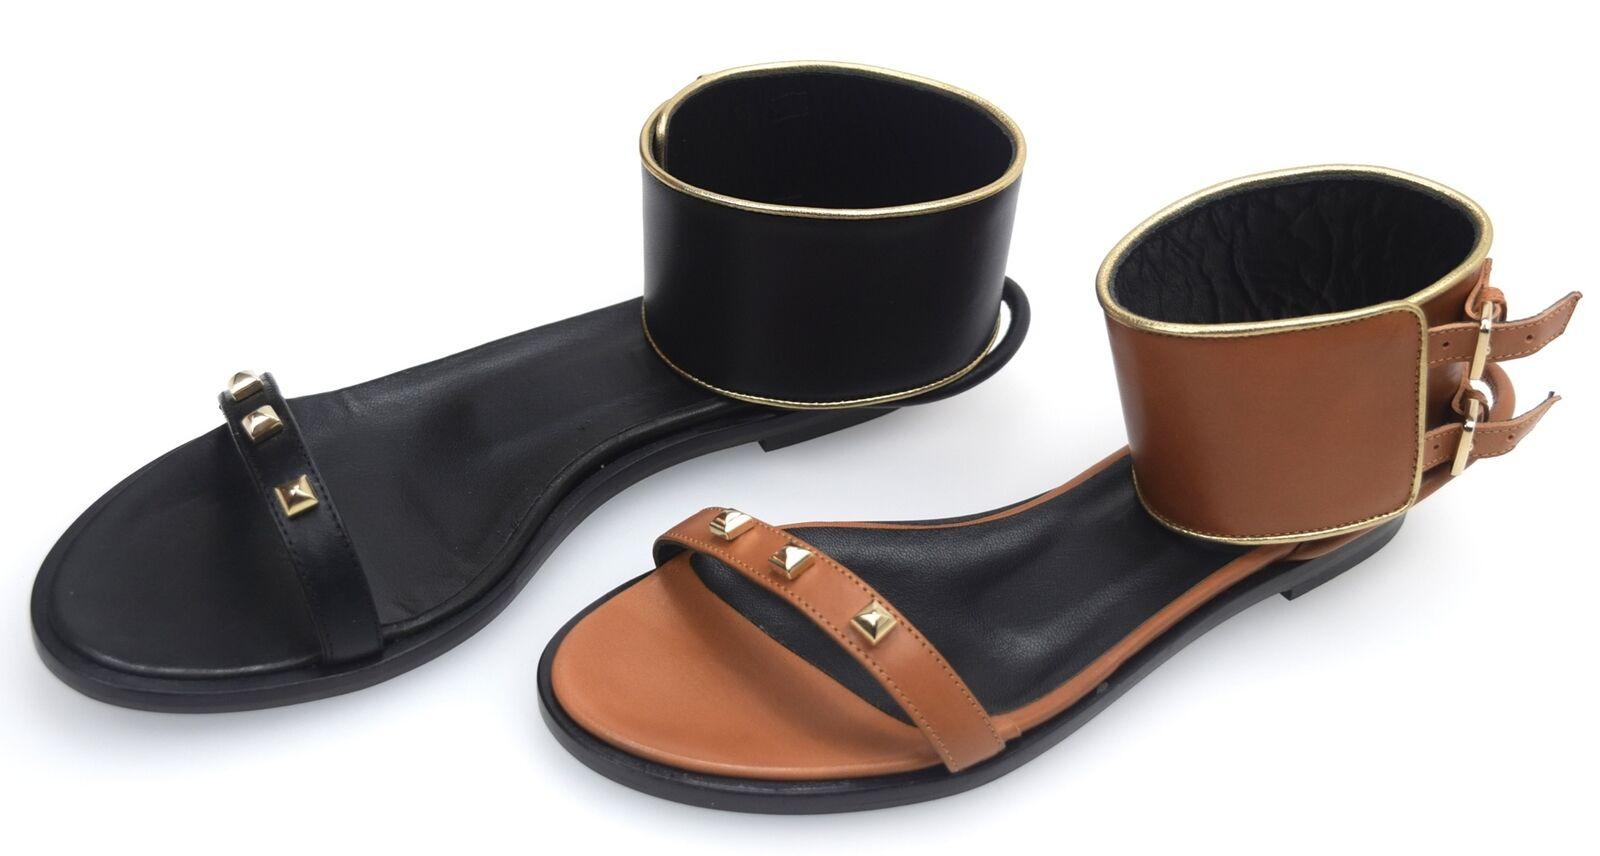 PATRIZIA Pepe Woman scarpe con Strap Casual Sandal 2v5643 ag88  k103 b207  grandi risparmi